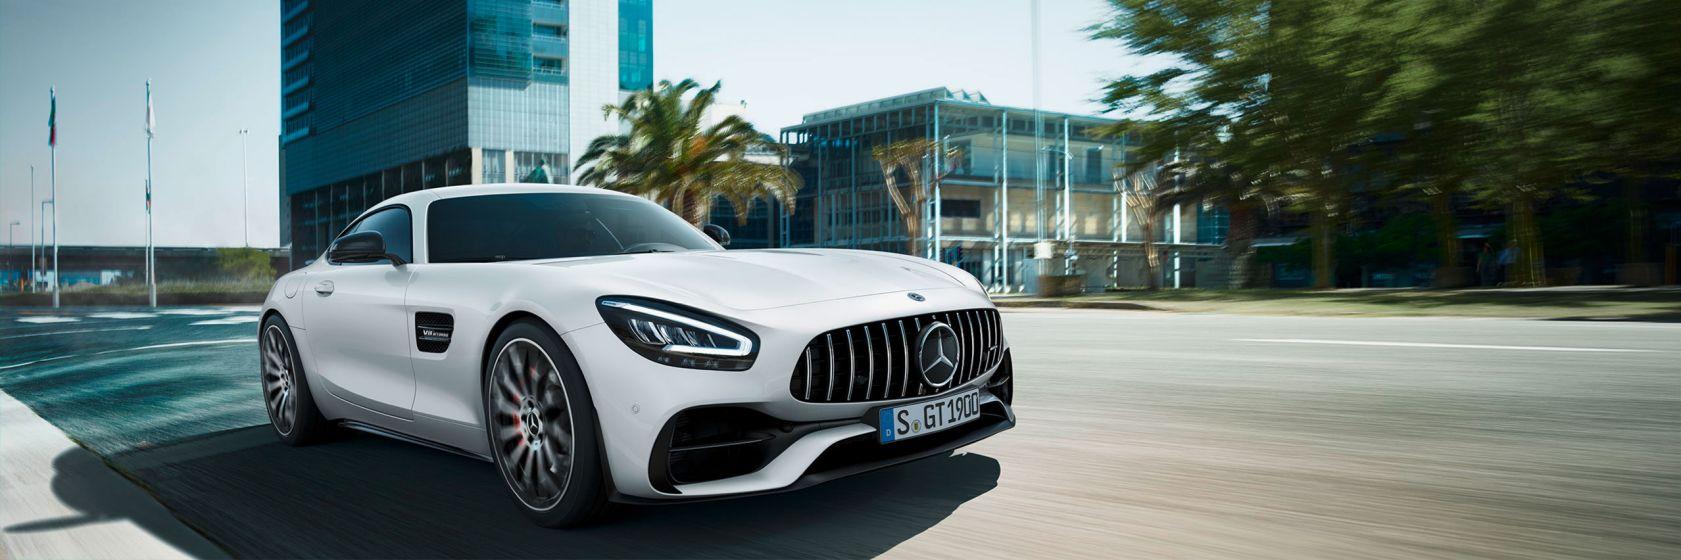 Mercedes-AMG GT купе